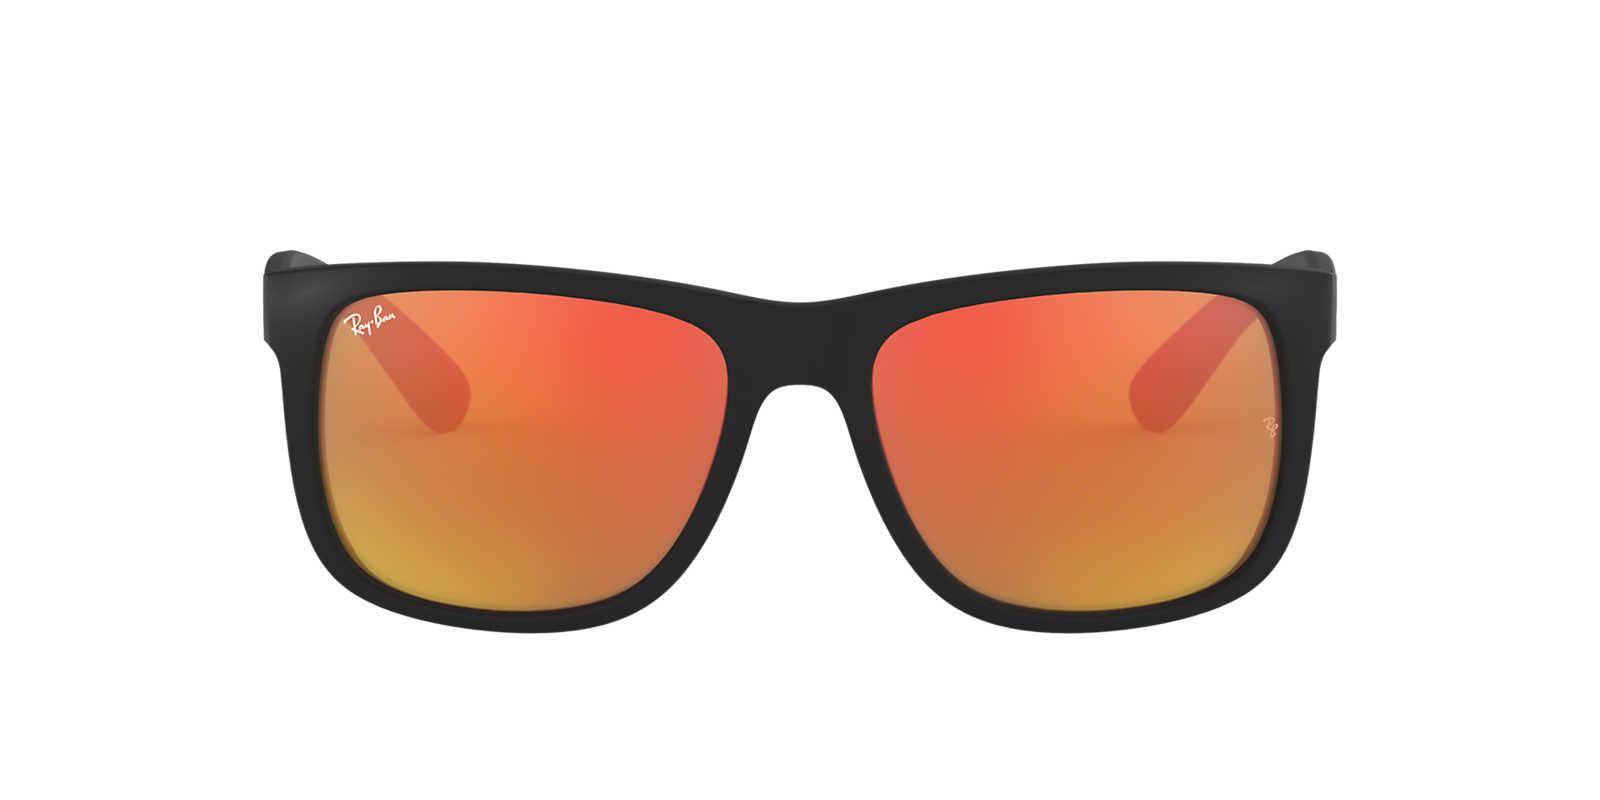 ray ban orange and black